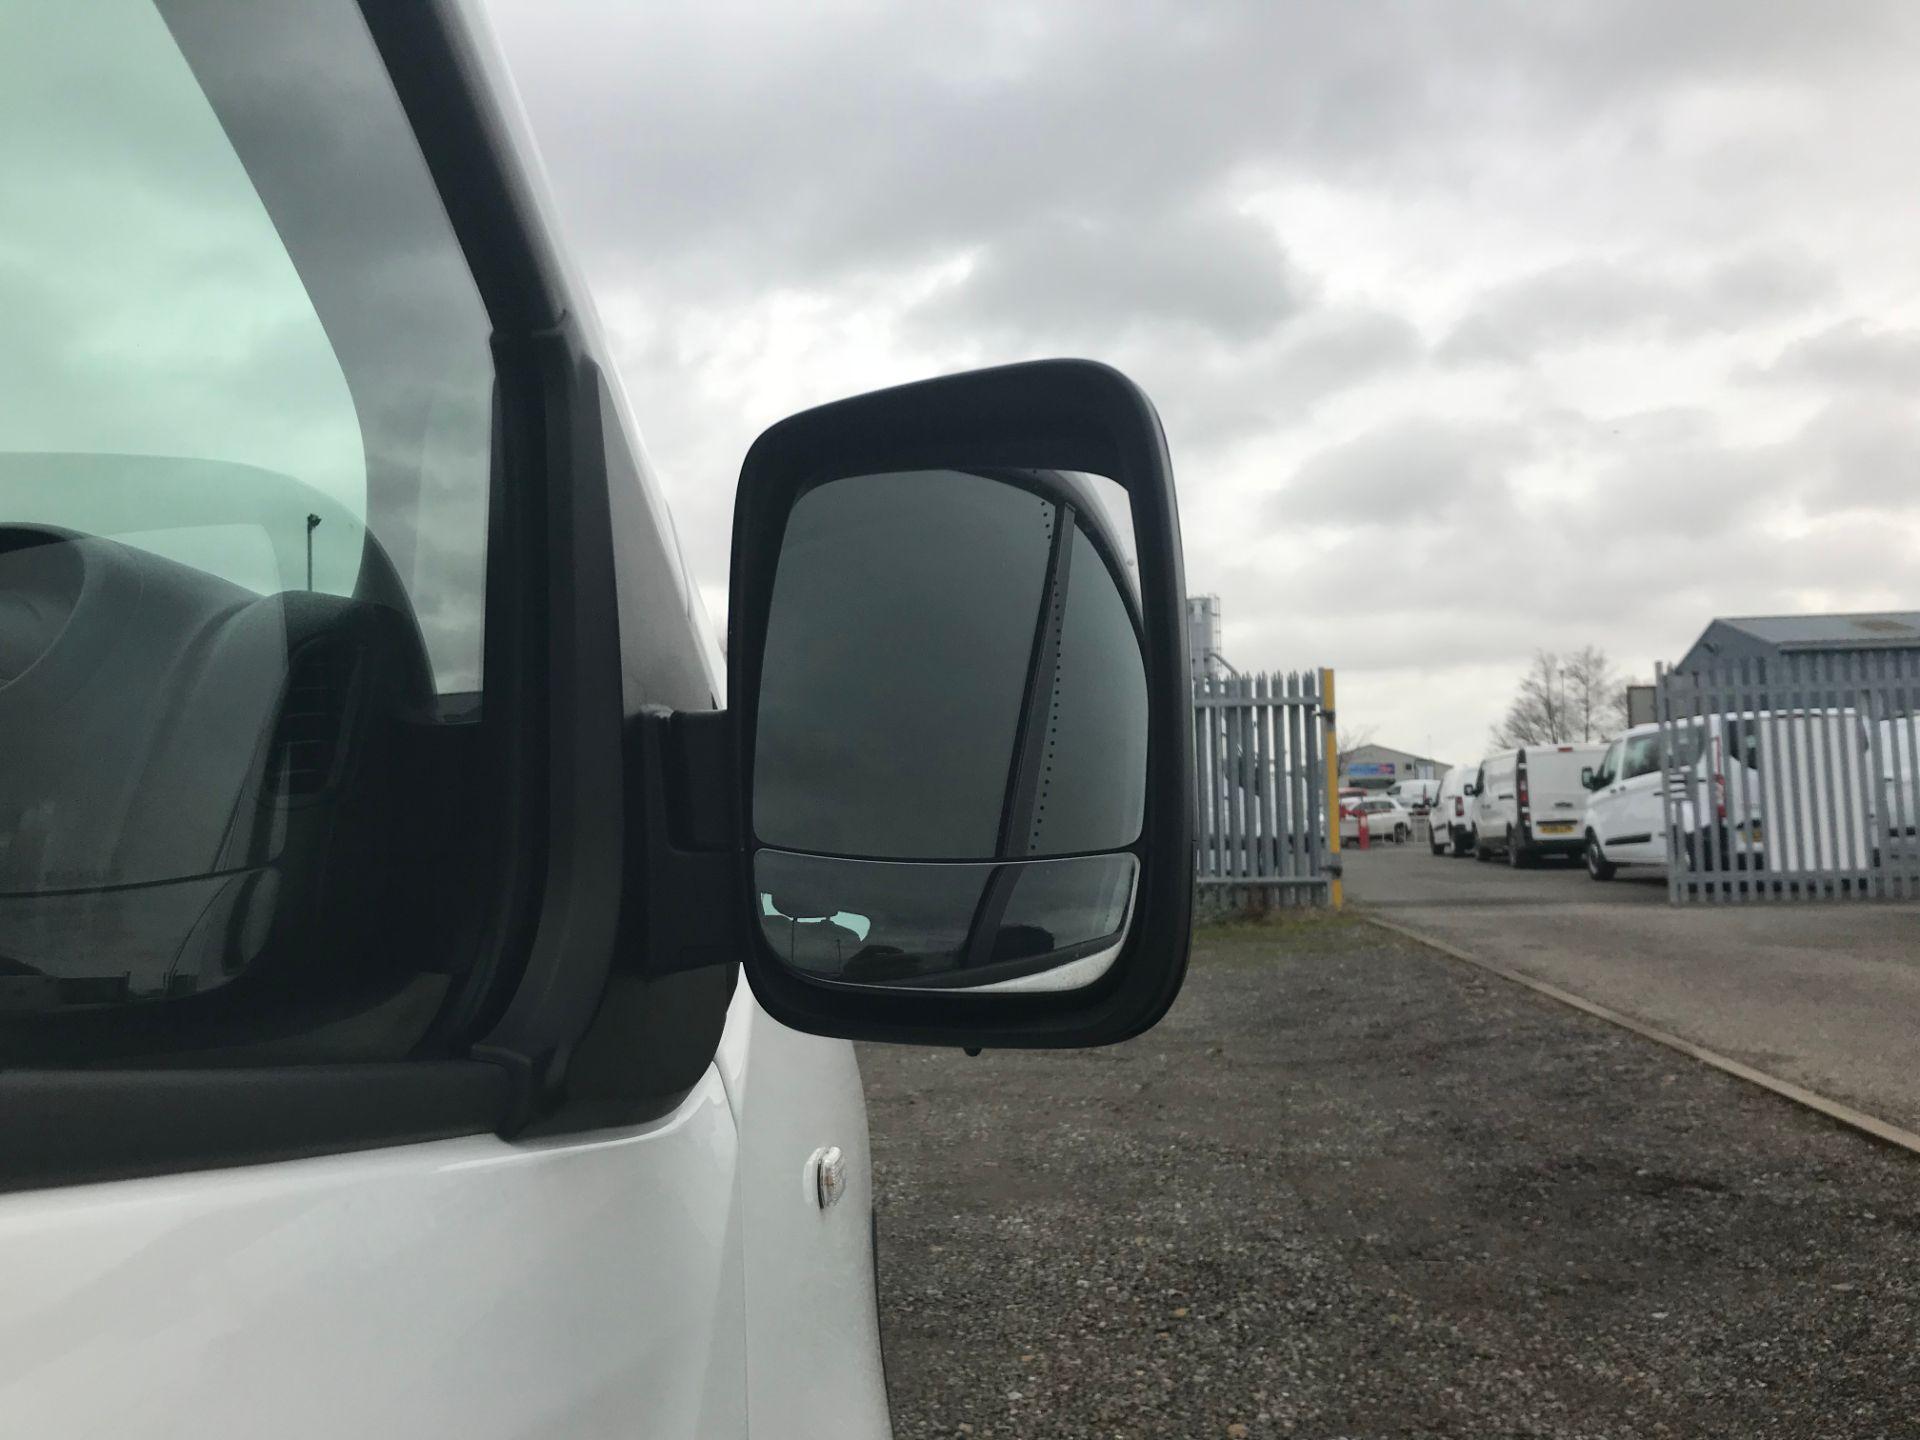 2017 Vauxhall Vivaro 2900 1.6Cdti Biturbo 125Ps H1 Combi 9 Seat (DY17UGS) Image 17